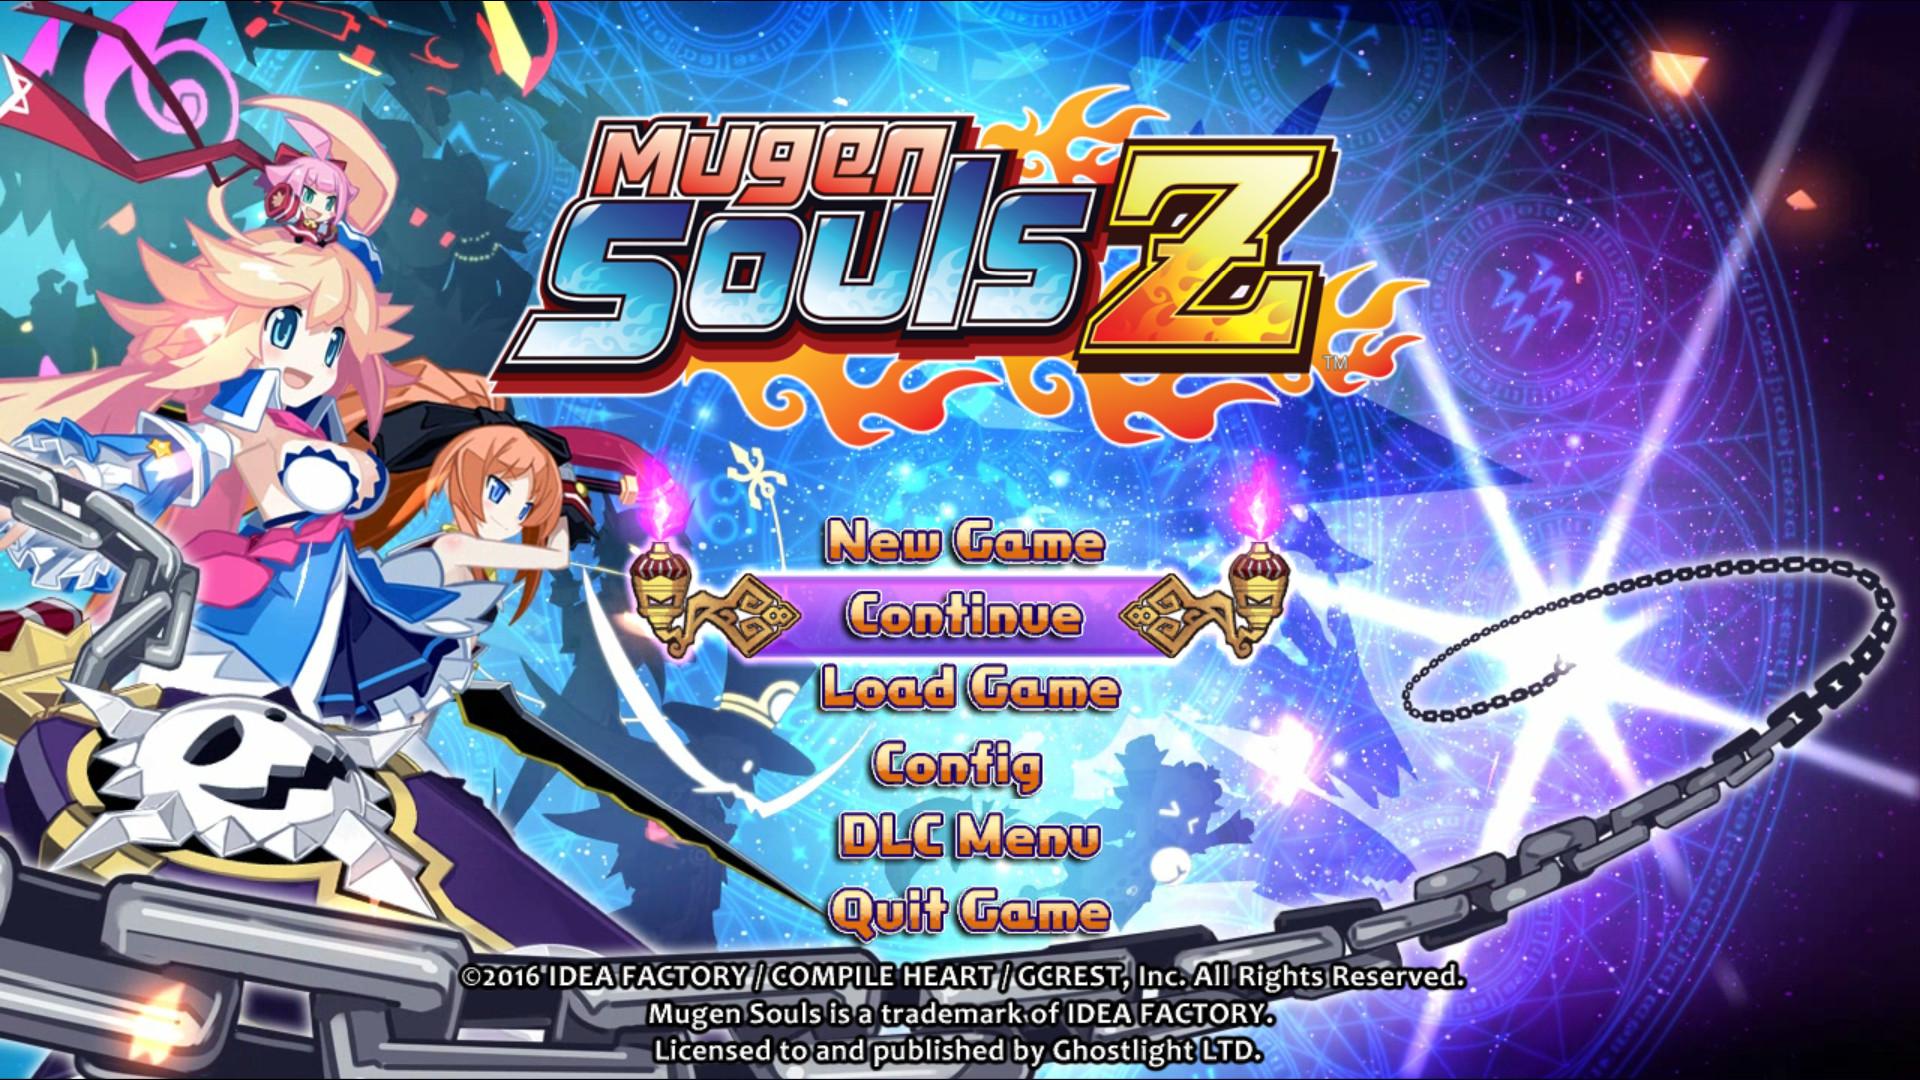 Mugen Souls Z - Overwhelming G Fever Bundle screenshot